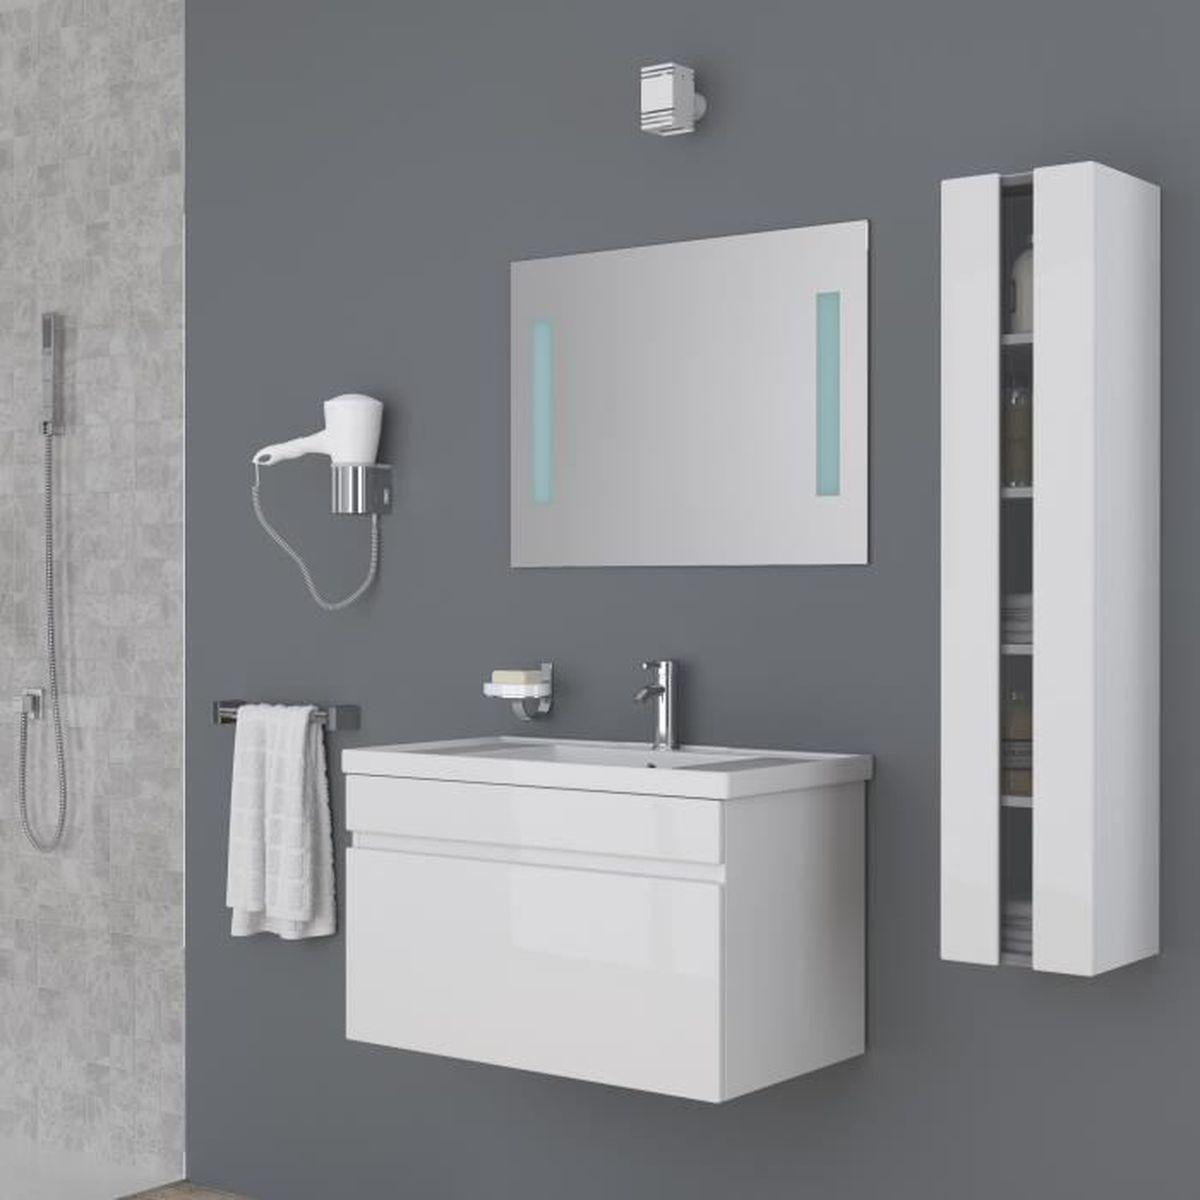 alban salle de bain compl te simple vasque 80 cm laqu. Black Bedroom Furniture Sets. Home Design Ideas